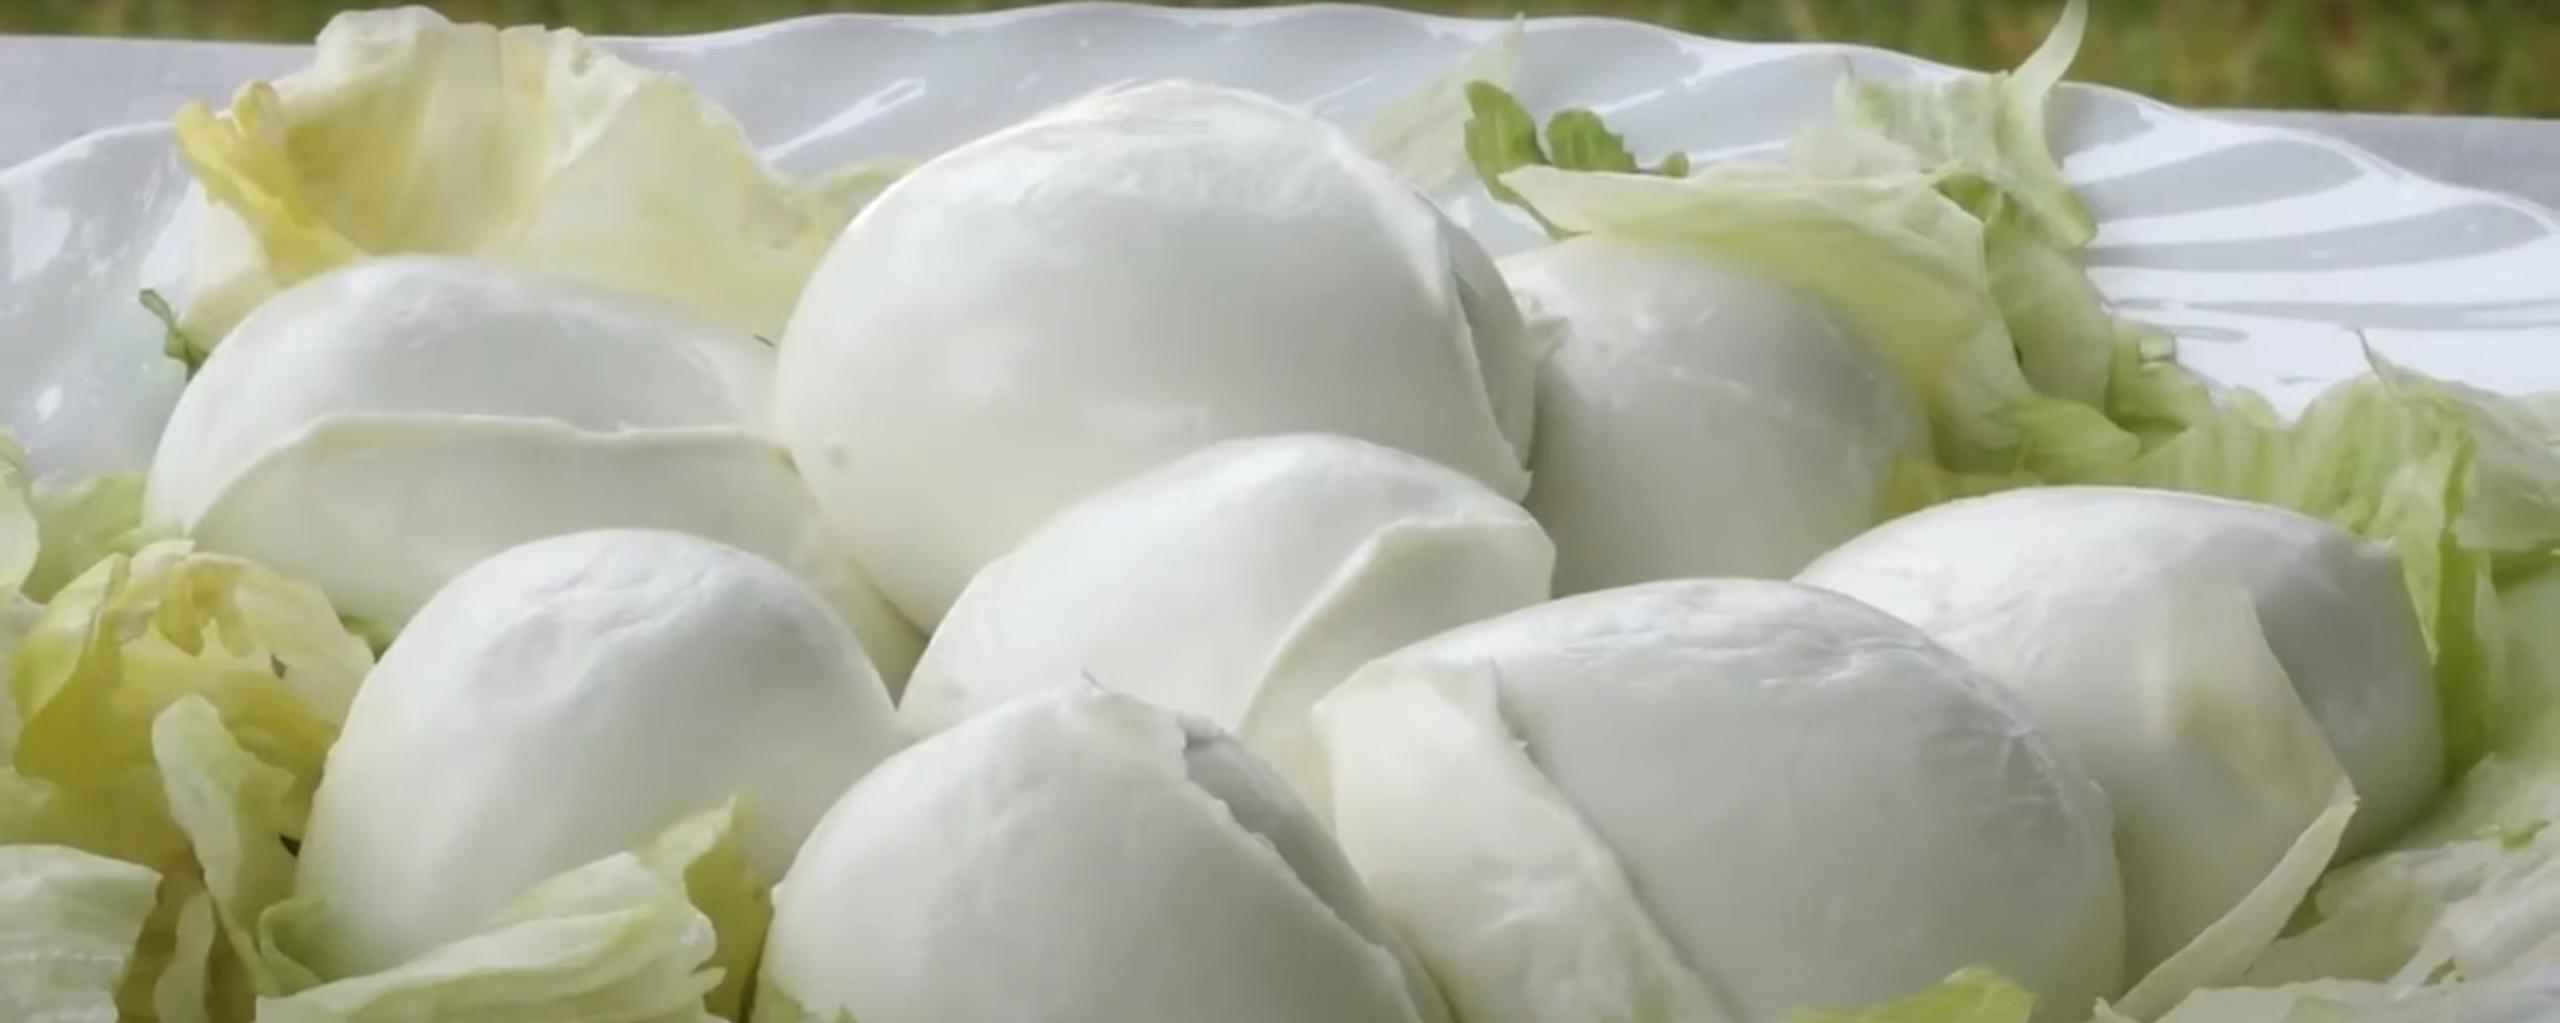 Mozzarella di bufala DOP Italiana